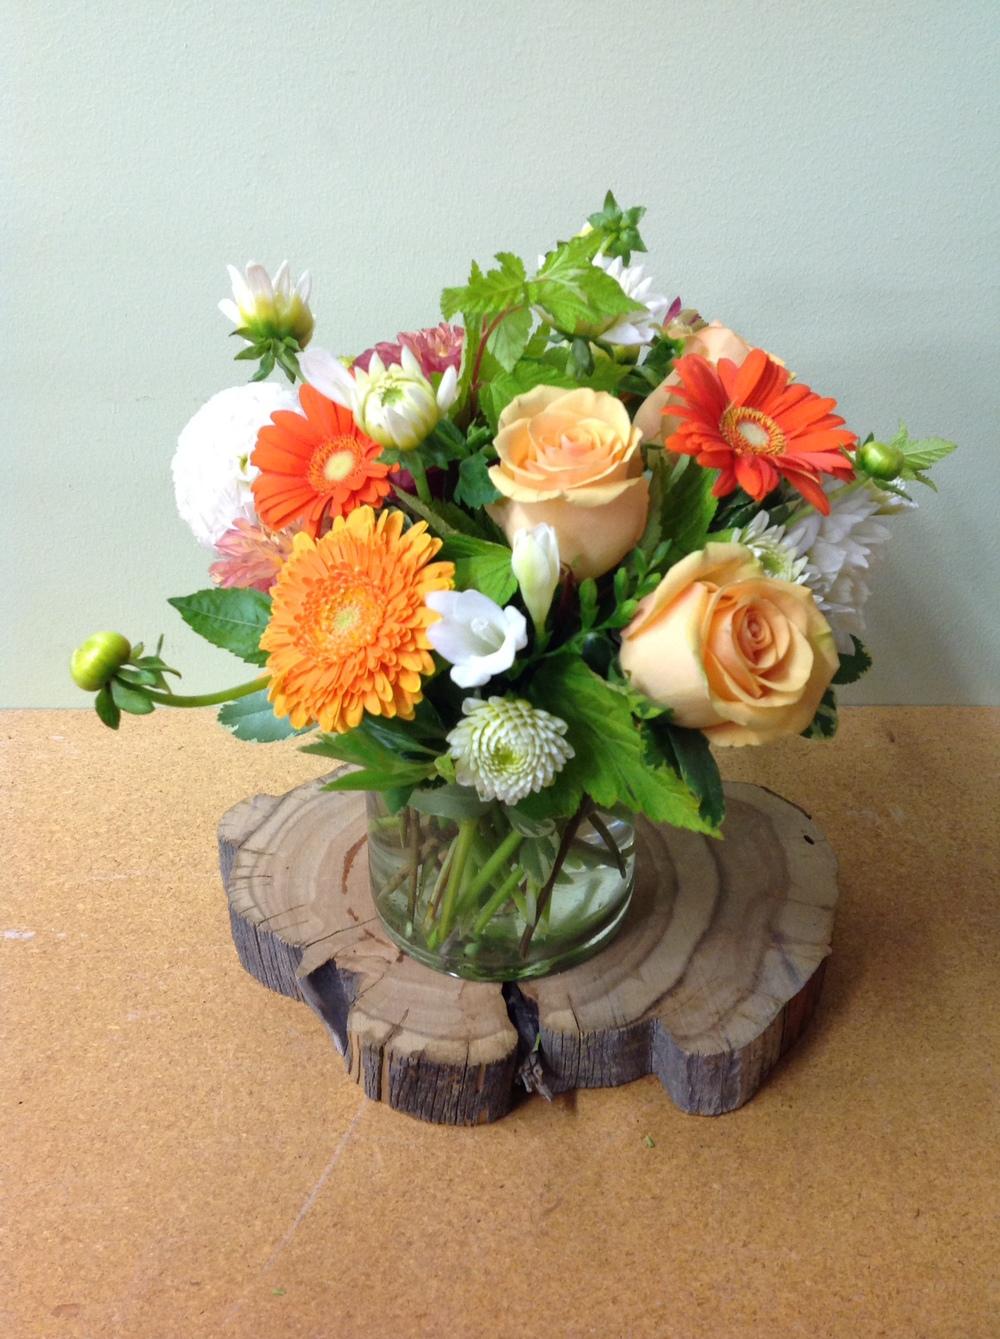 7. Gerbers and Roses